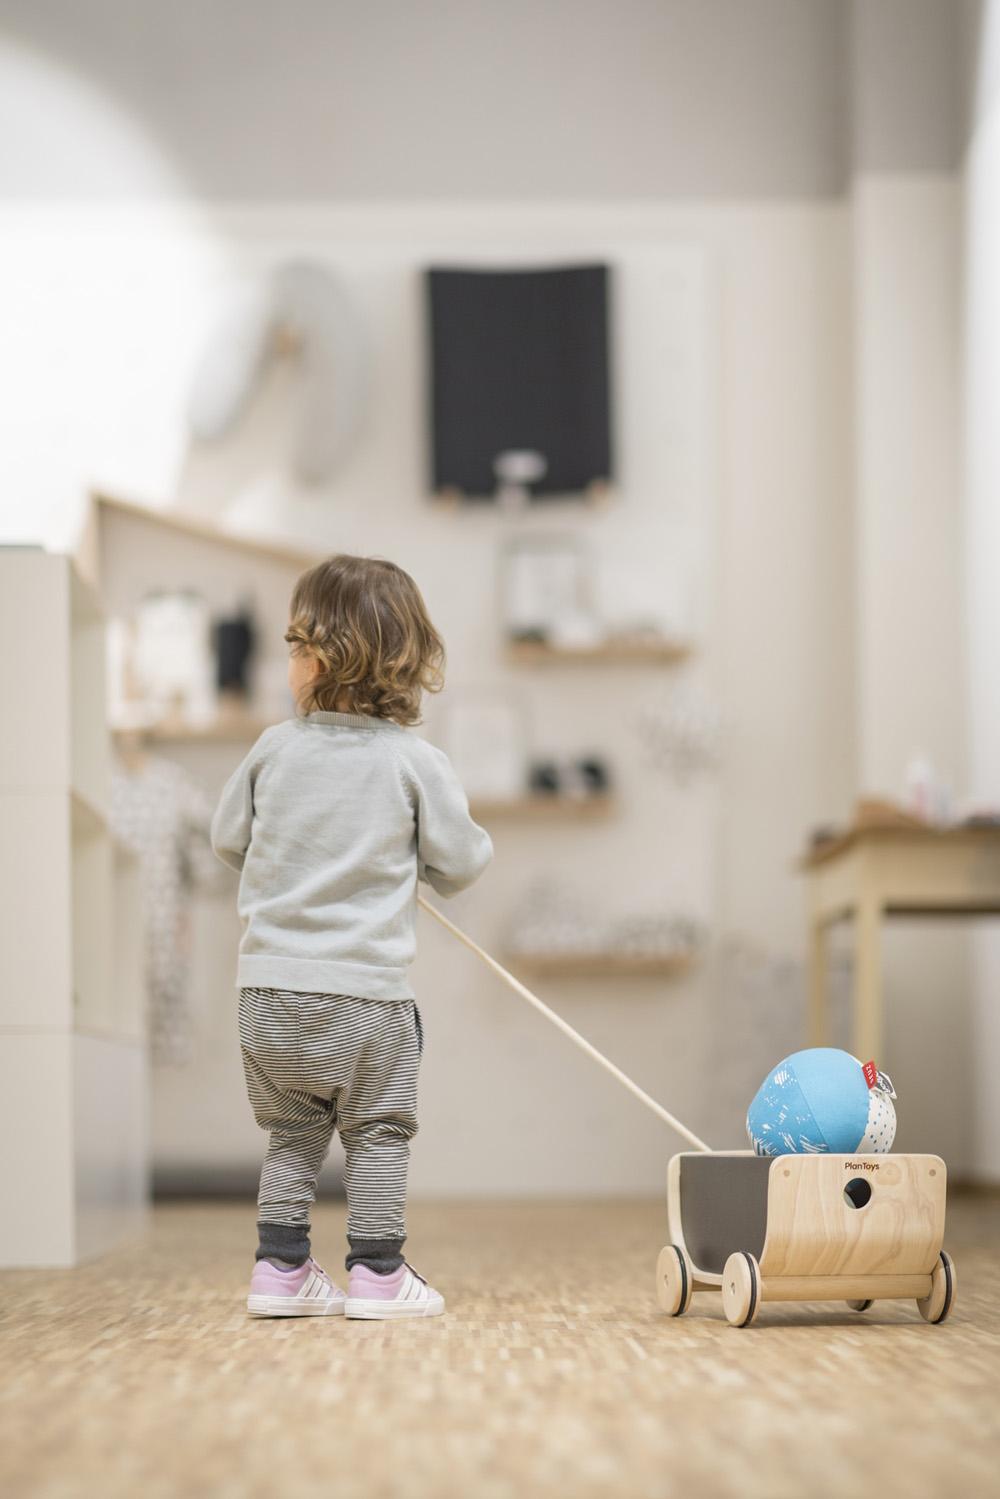 Mini & Stil, Mama Blog Schweiz, Familien Blog, Baby Blog, Kindermode, Shops, Kinderläden, Kindermöbel, yolyo